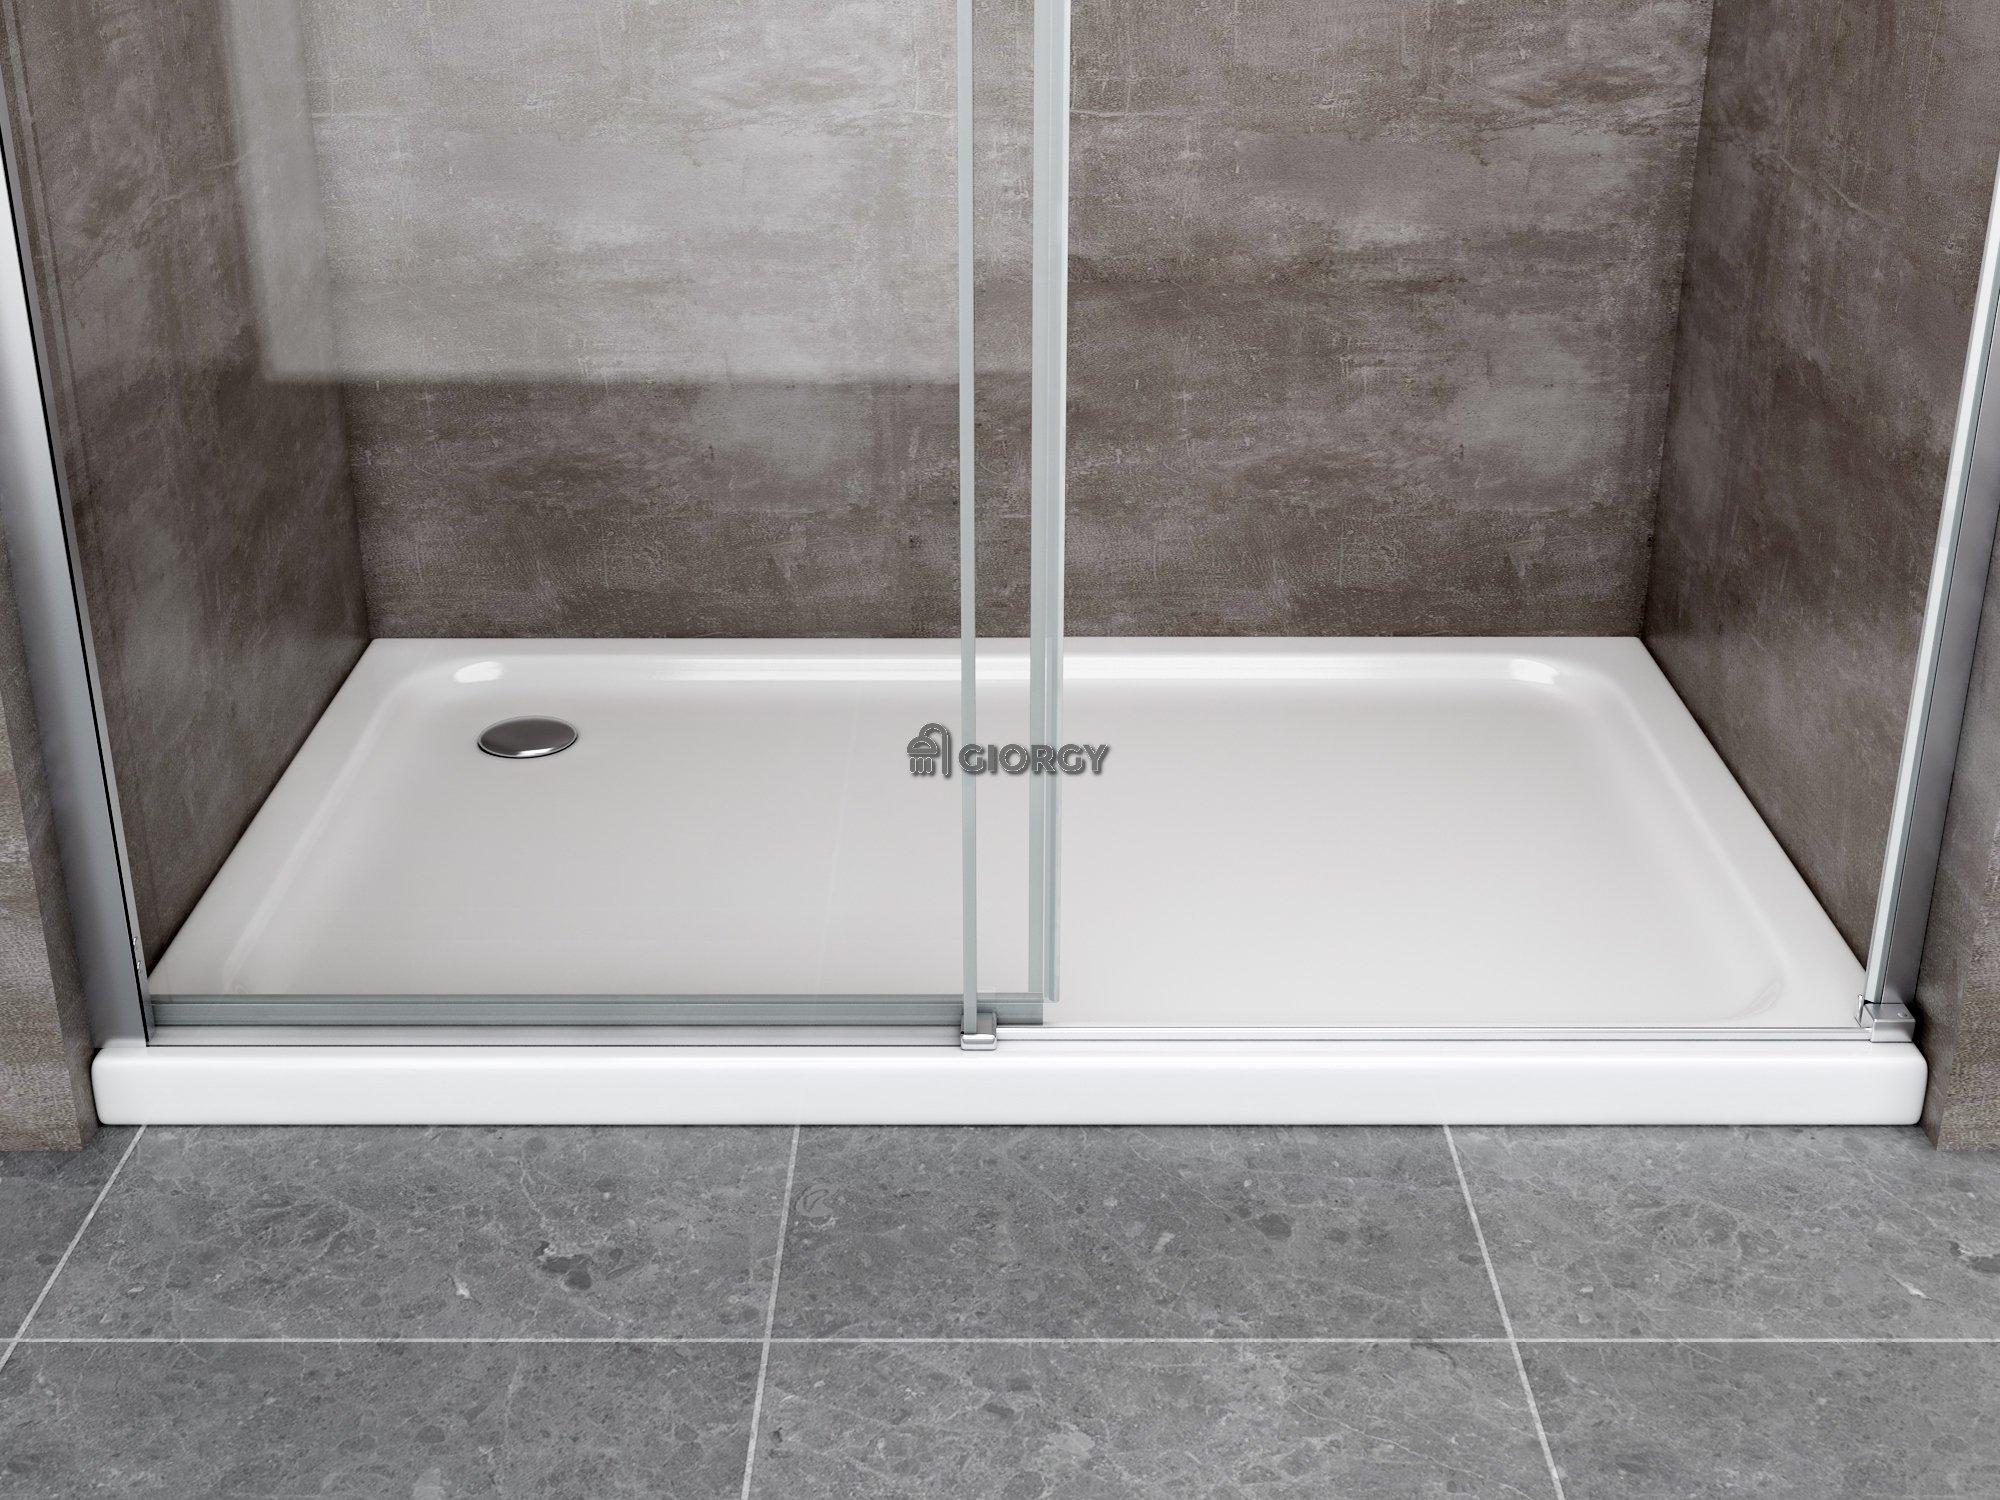 Porta doccia per nicchia 8 mm apertura scorrevole giorgyshopgiorgyshop - Porta scorrevole per doccia ...